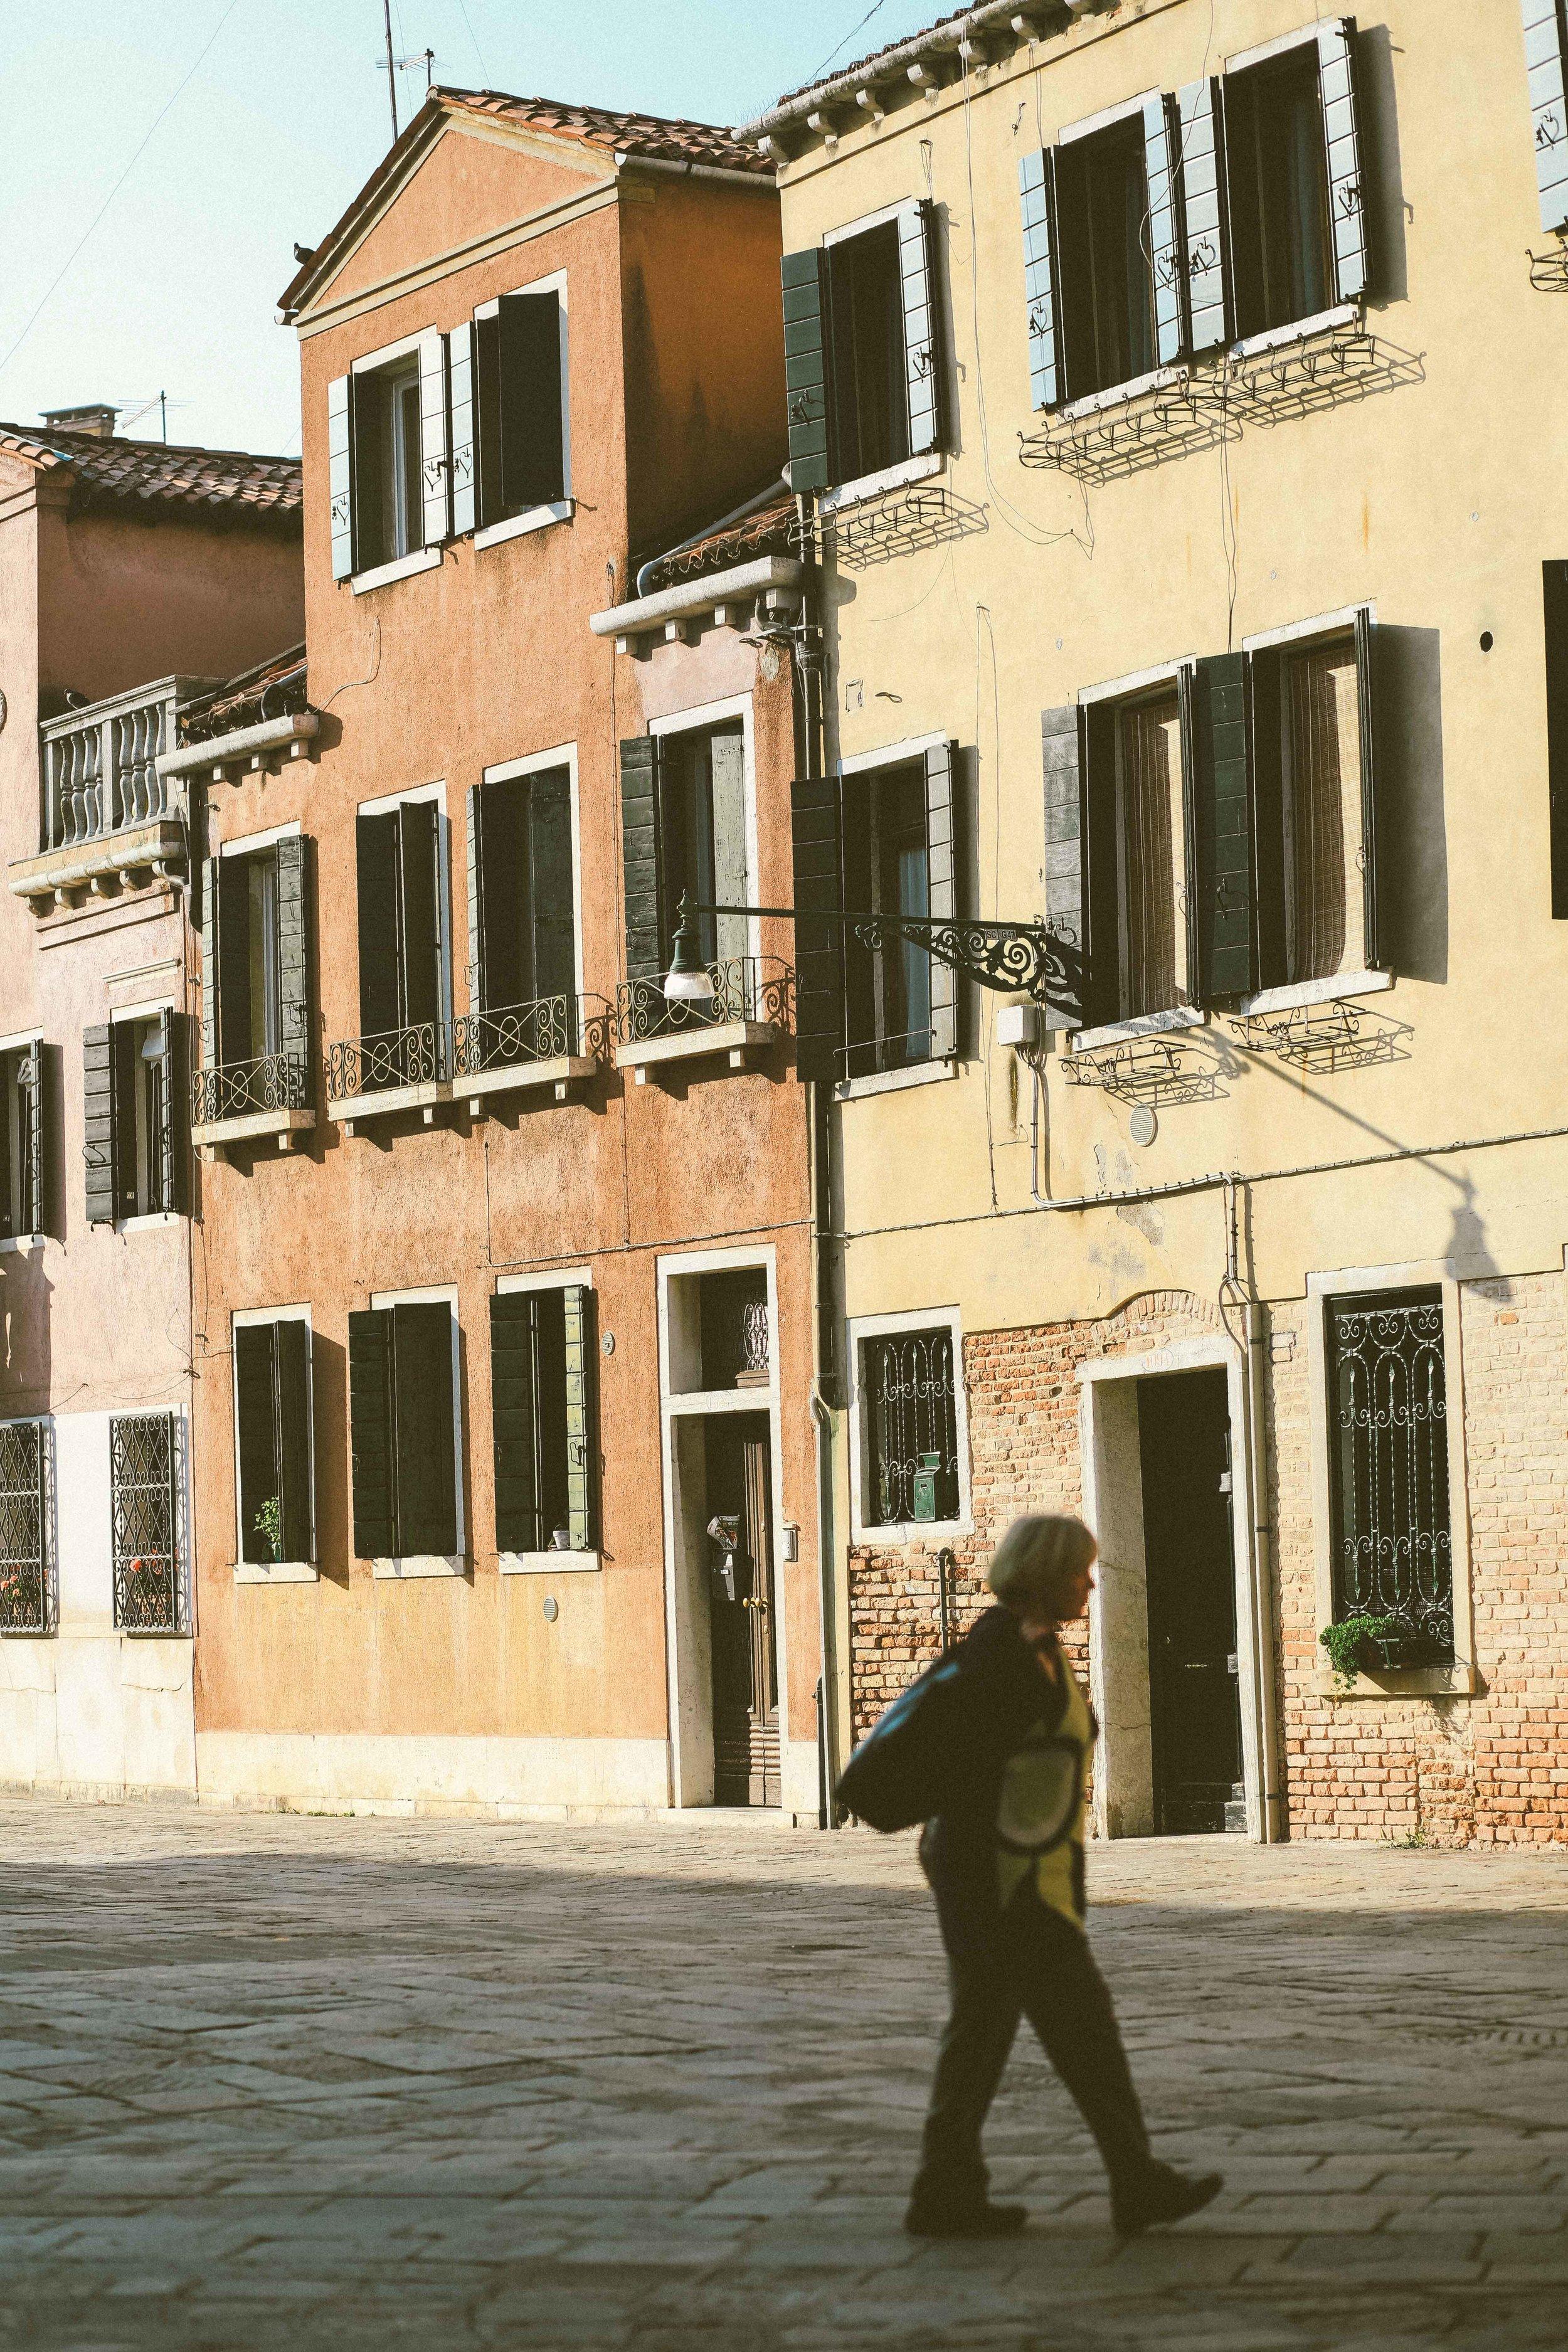 Street_Photography_Venice_Italy_6.jpg